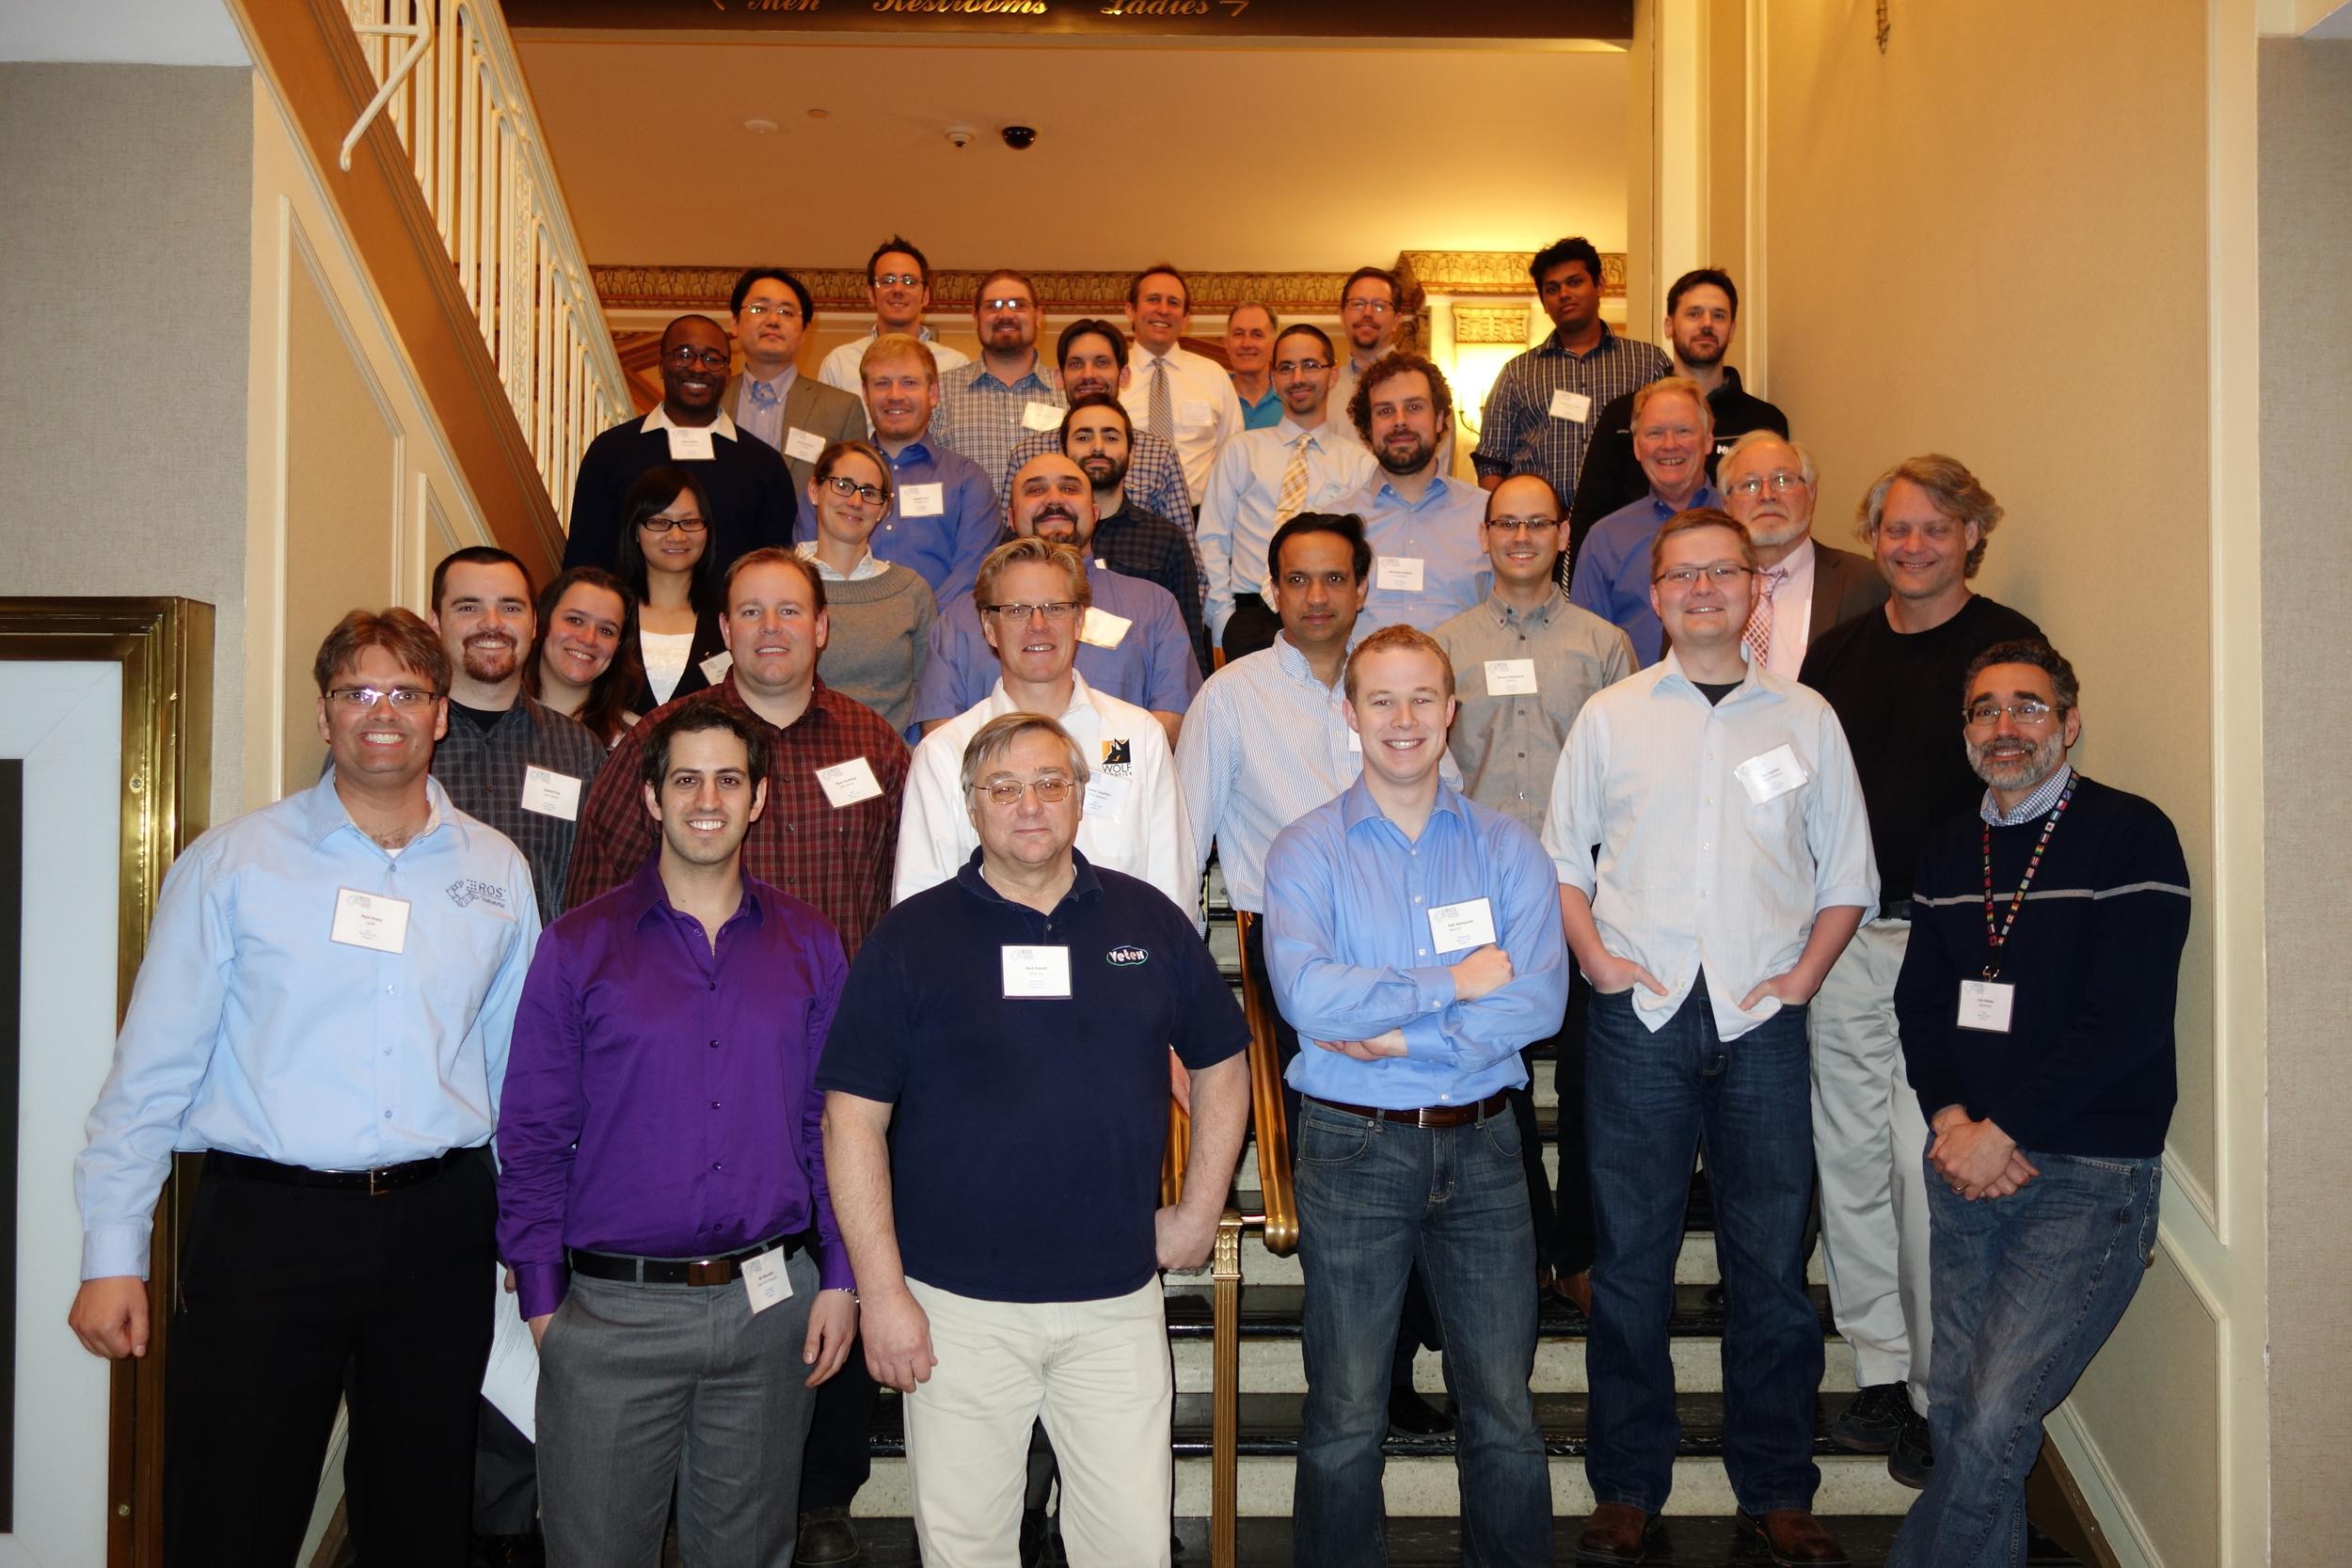 ROS-I Consortium Americas Annual Meeting Attendees - 2015